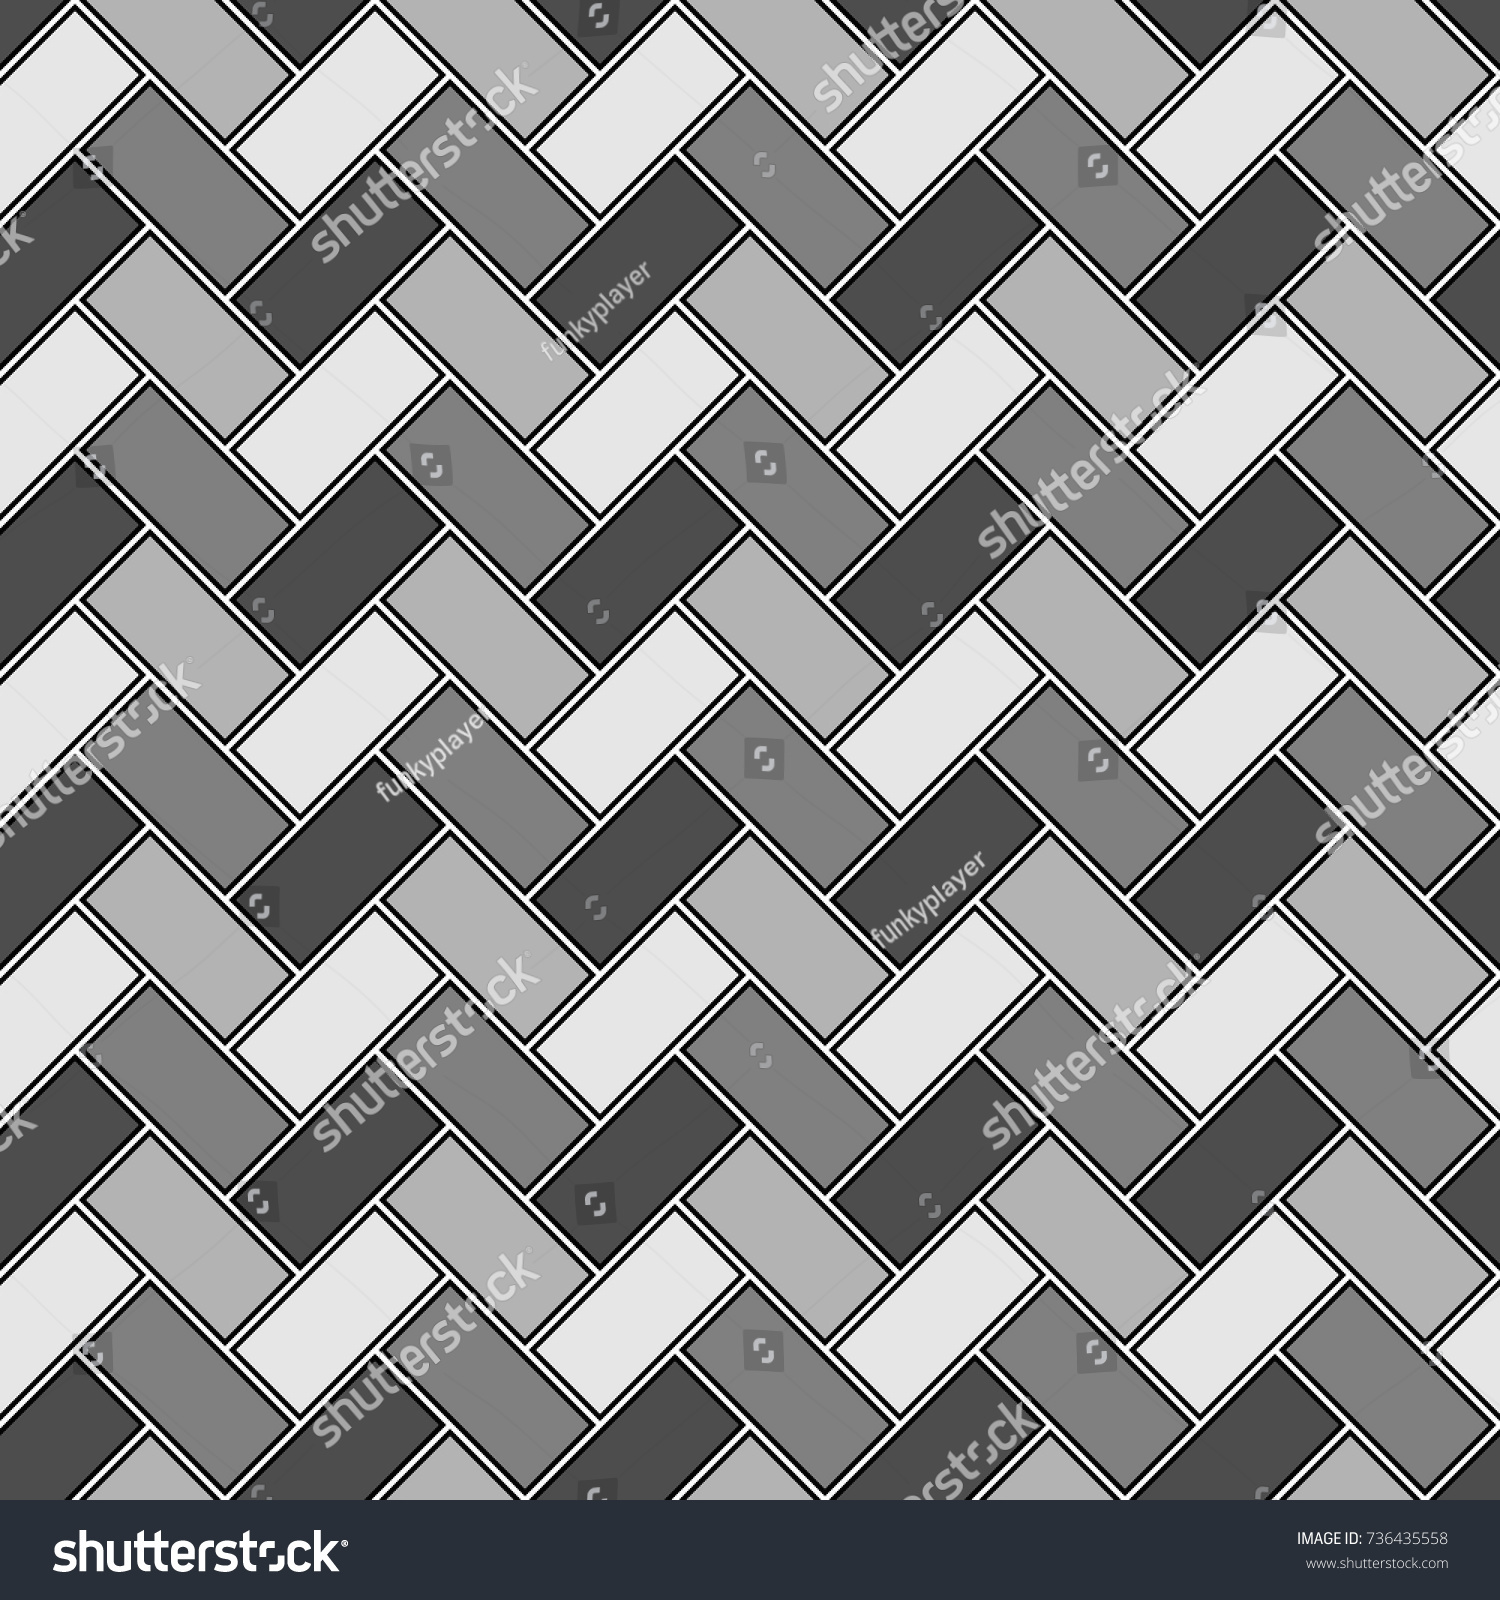 Herringbone pattern rectangles slabs tessellation seamless stock rectangles slabs tessellation seamless surface design with slanted blocks tiling floor dailygadgetfo Images